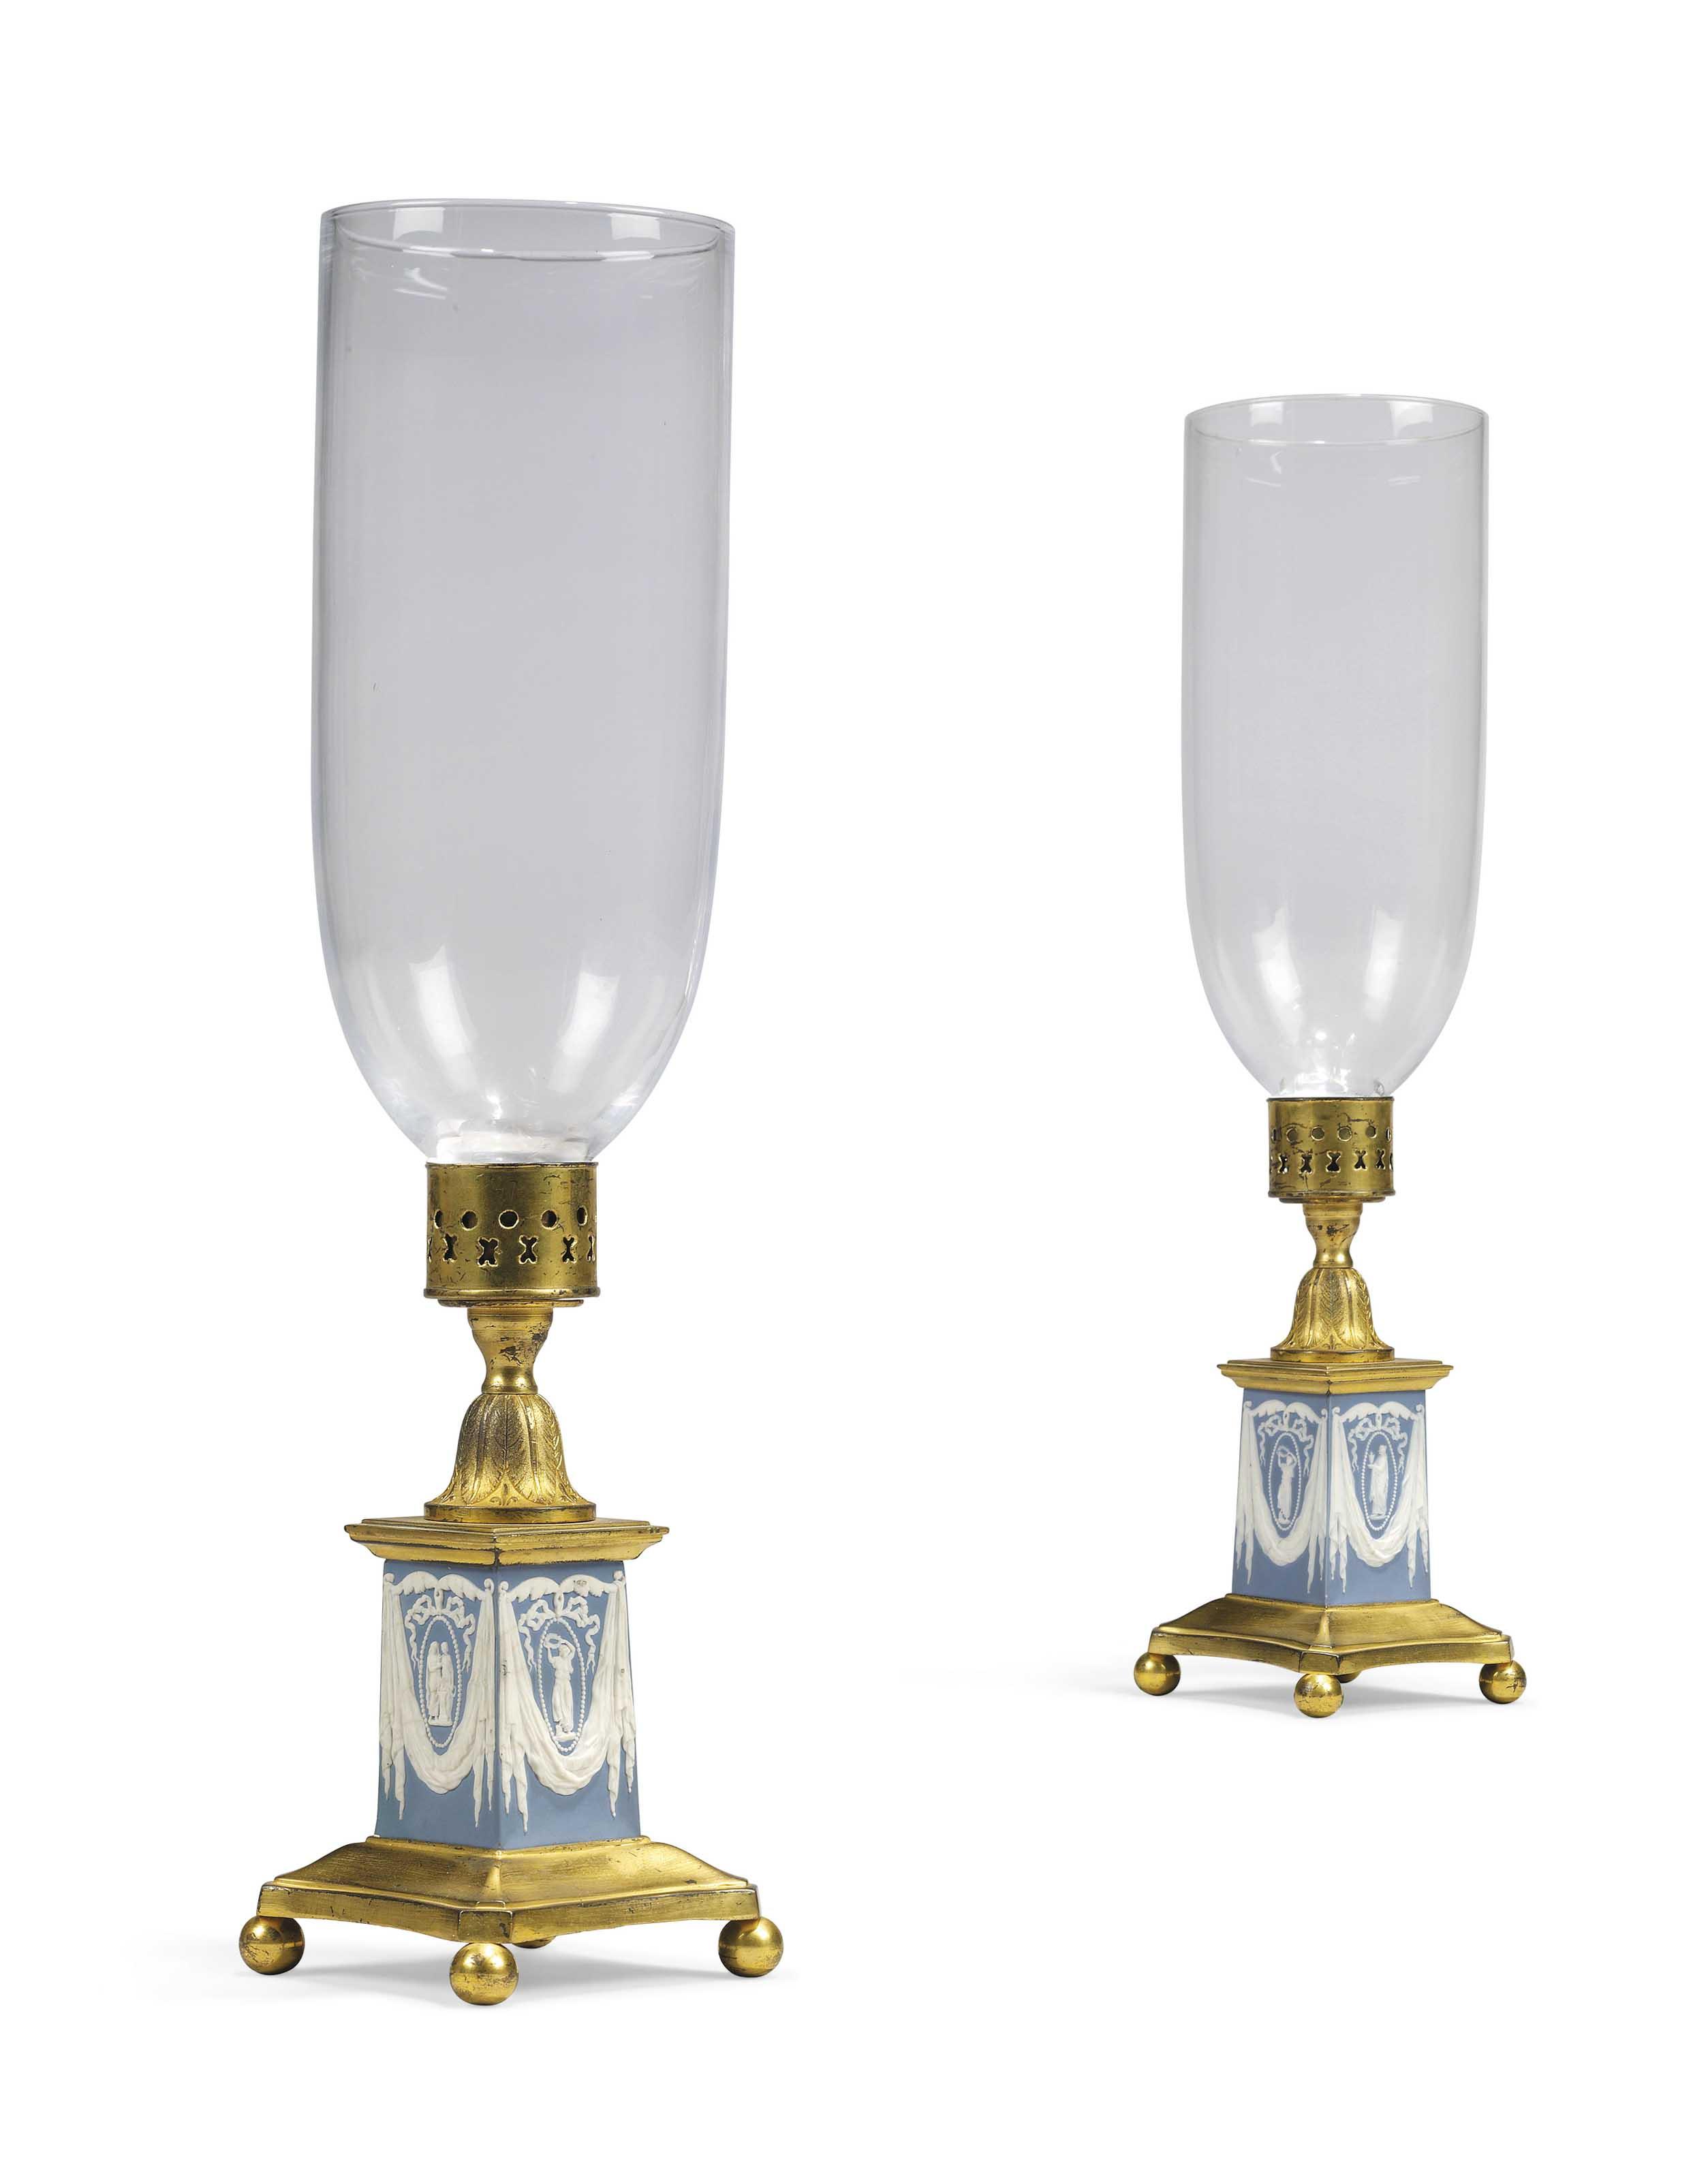 A PAIR OF GEORGE III GILT-METAL-MOUNTED JASPERWARE CANDLESTICKS